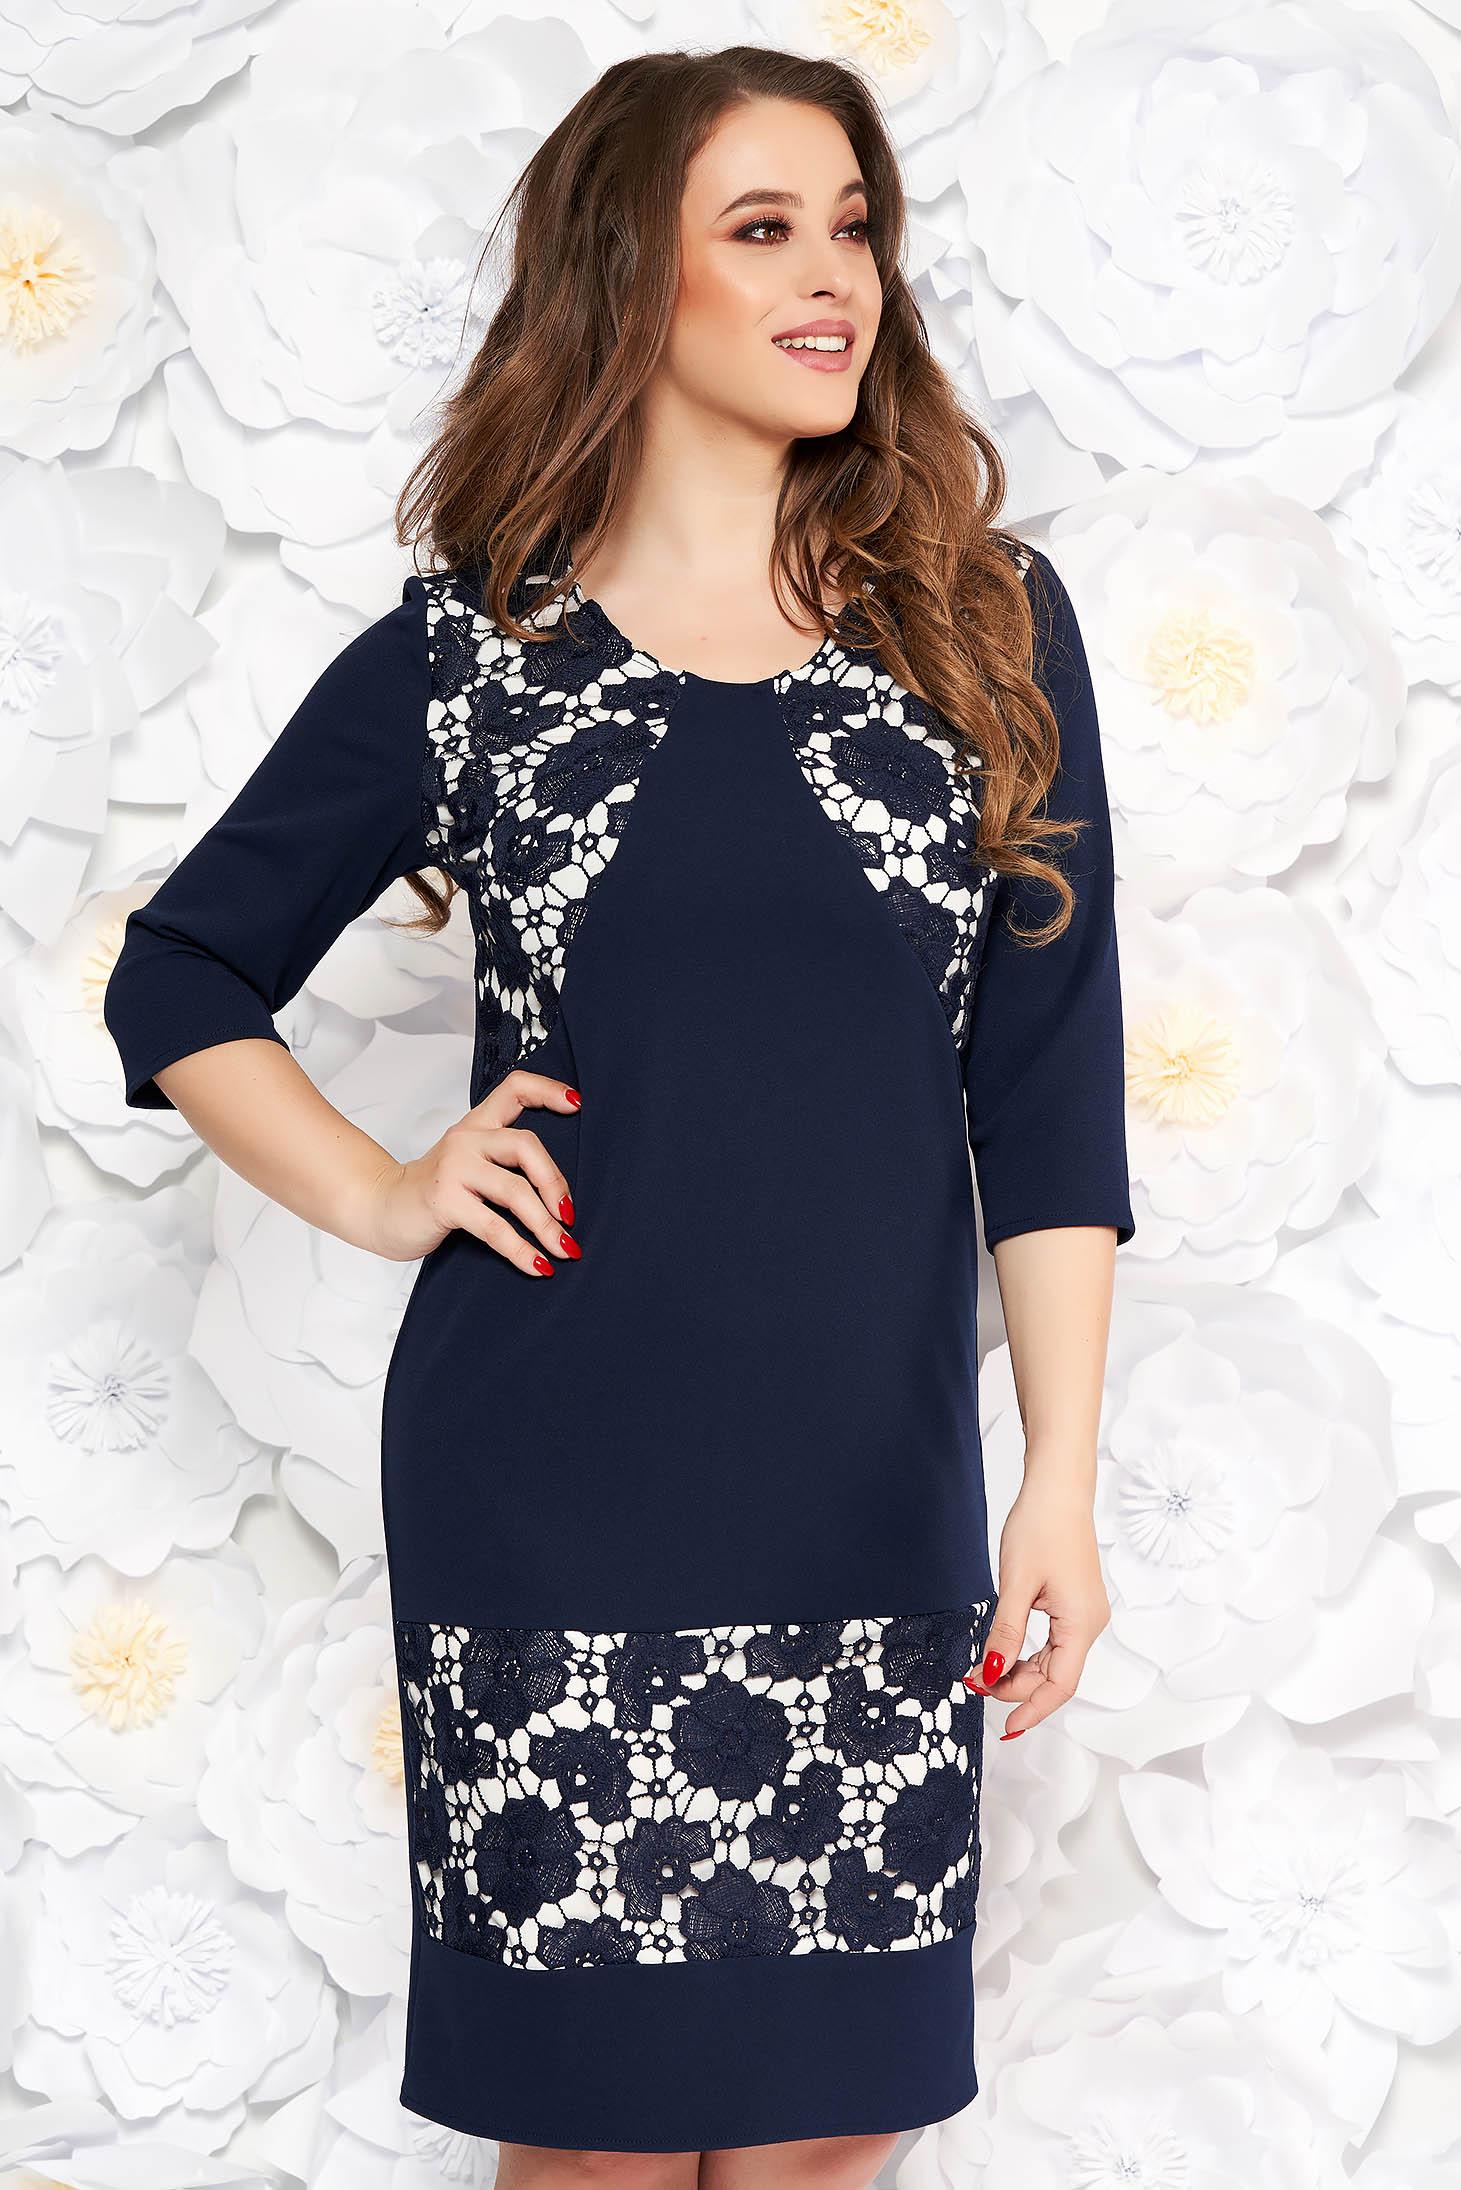 Rochie albastru-inchis eleganta cu un croi drept din material usor elastic cu aplicatii de dantela